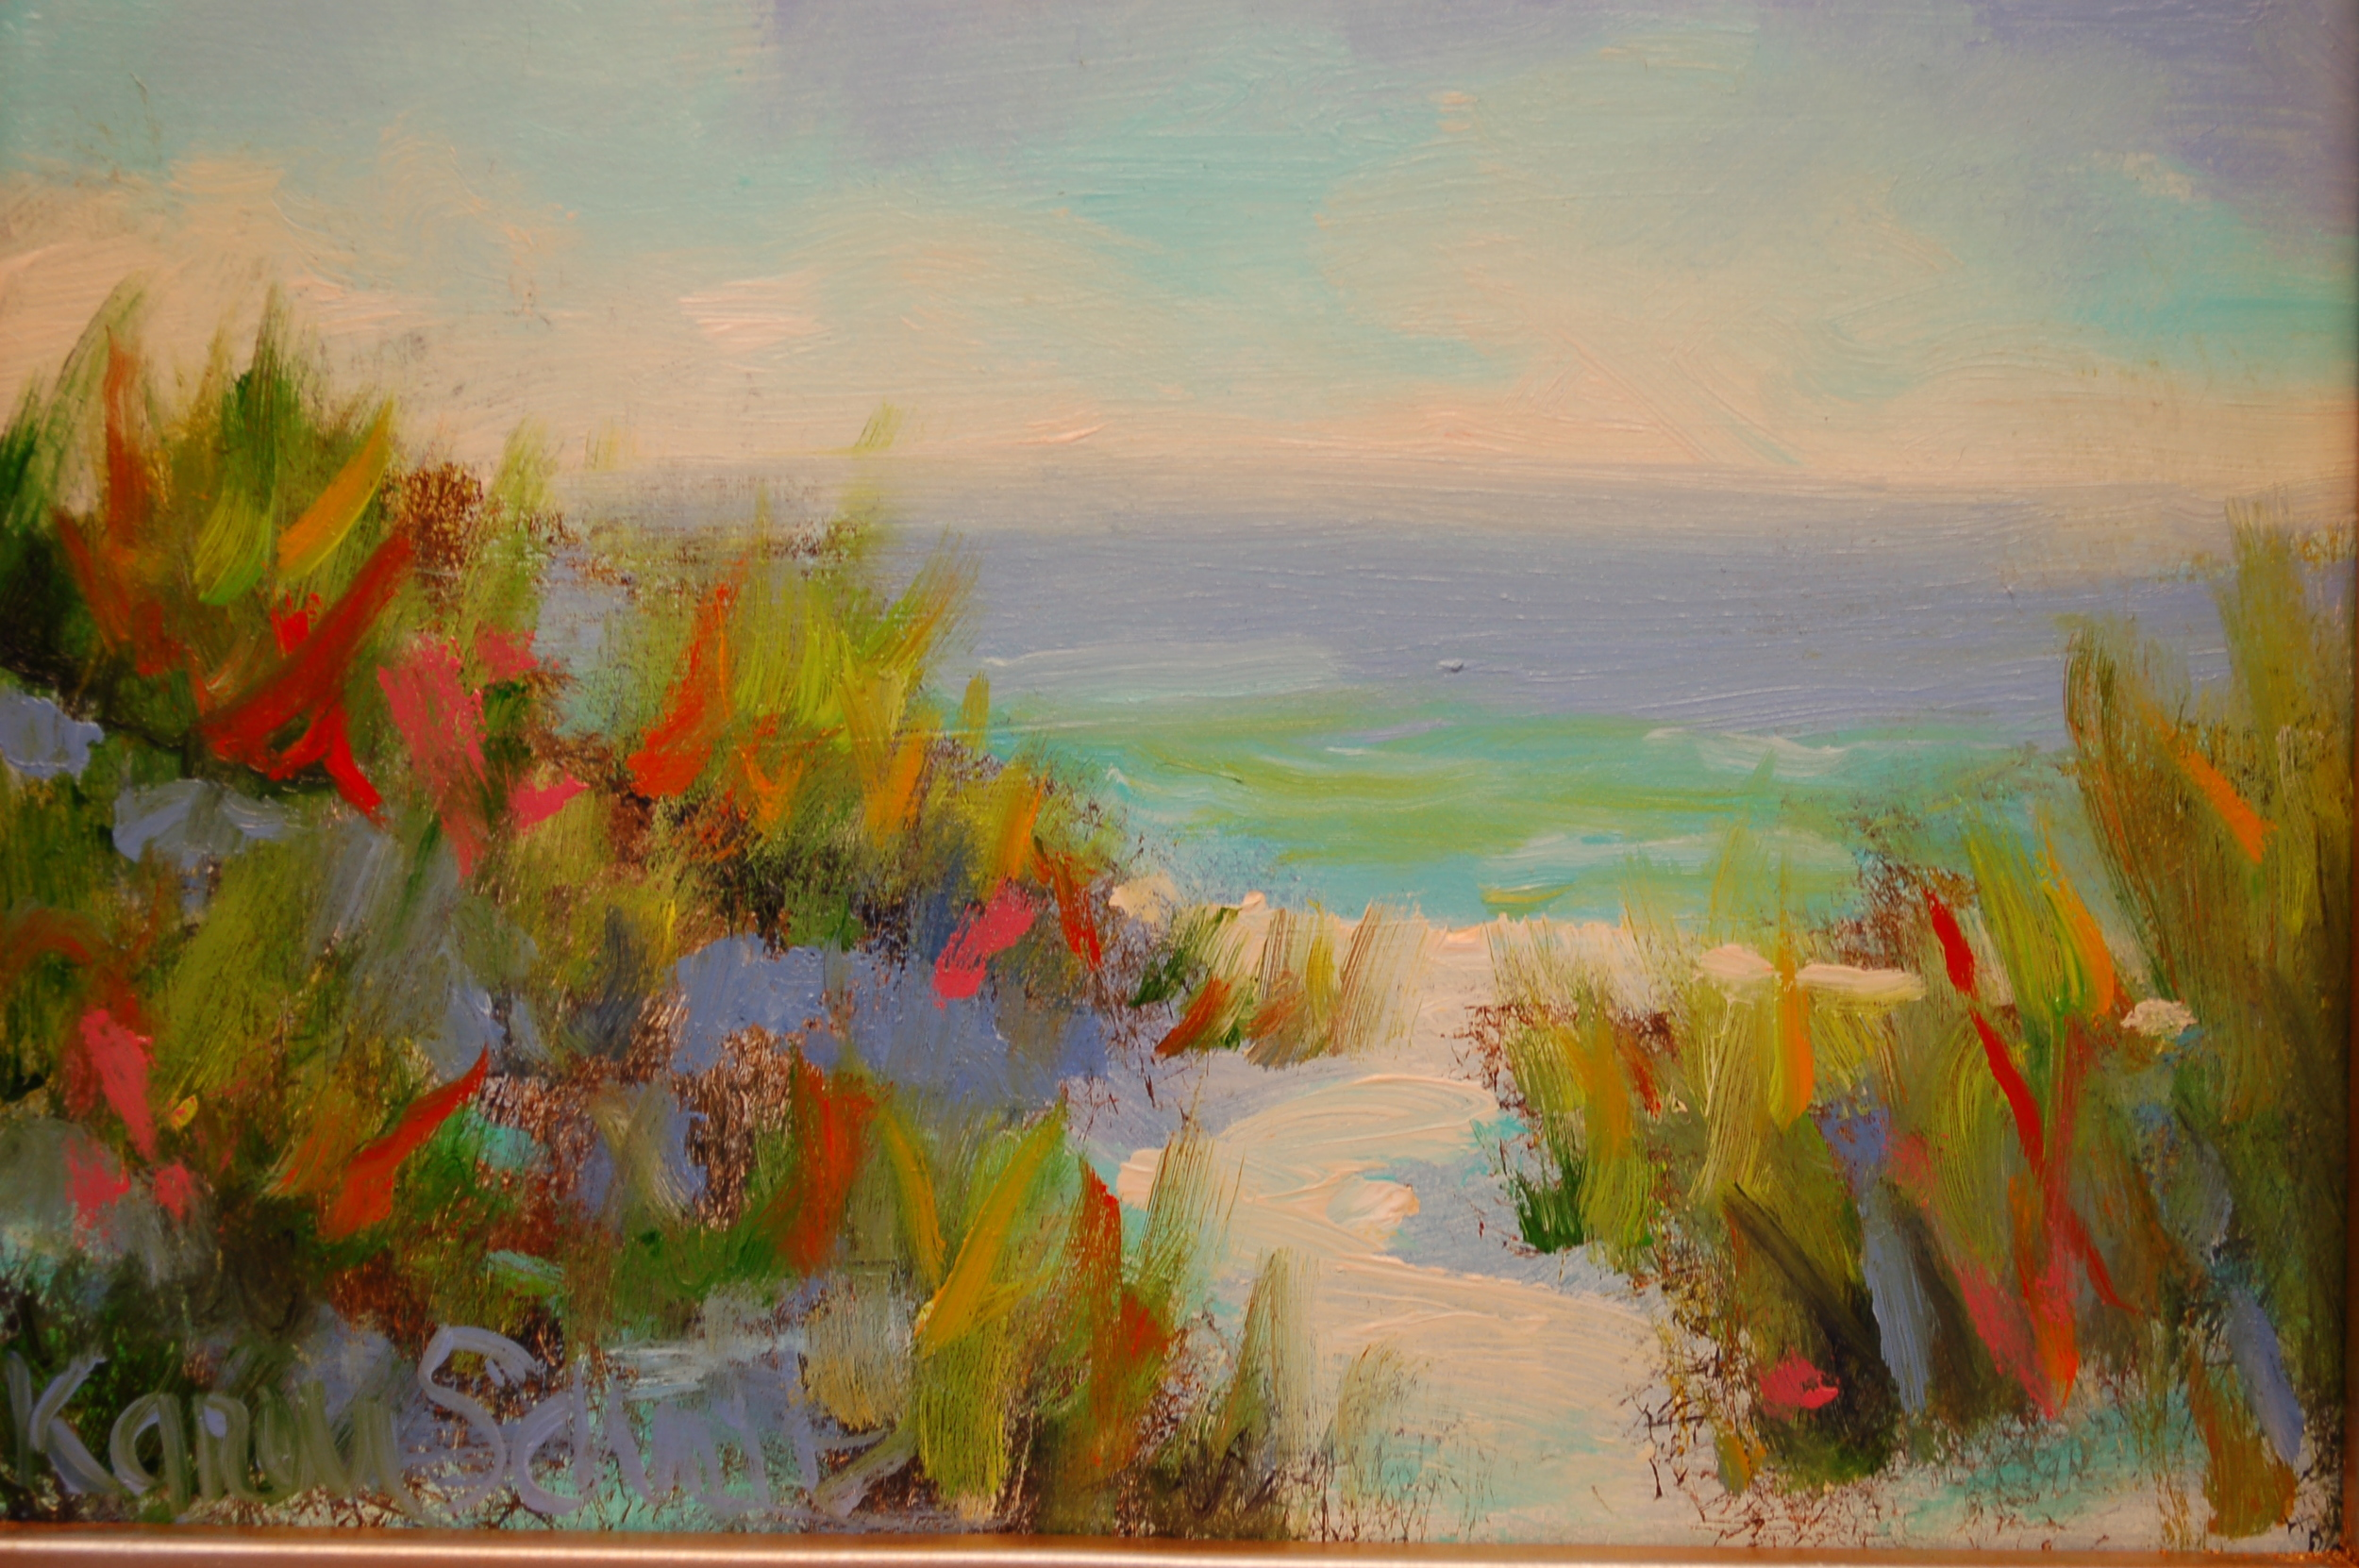 K Schmitz_Another Beach Day_oil on panel_5x7_295.jpg